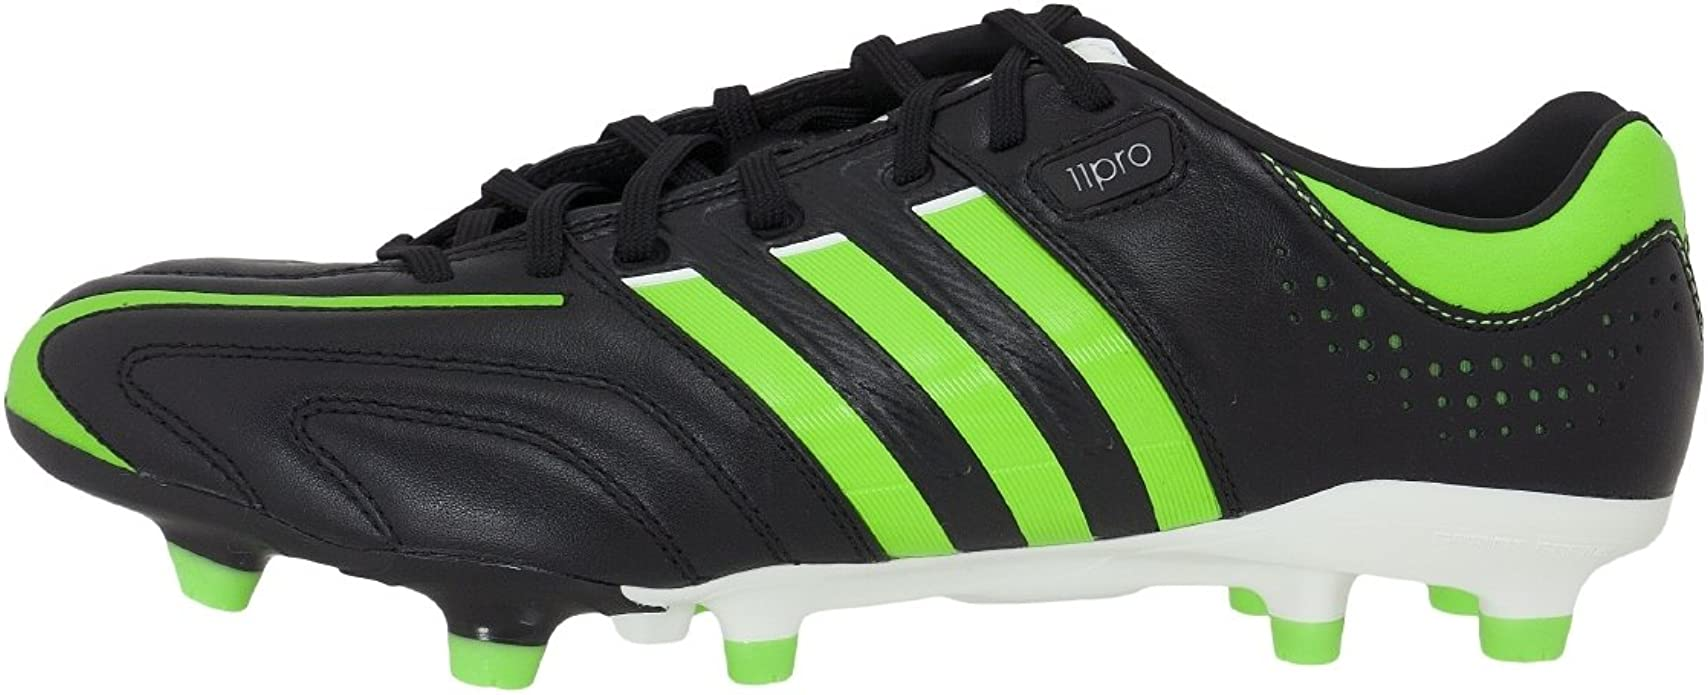 adidas Adipure 11pro TRX Chaussures De Football pour Terrain Dur ...